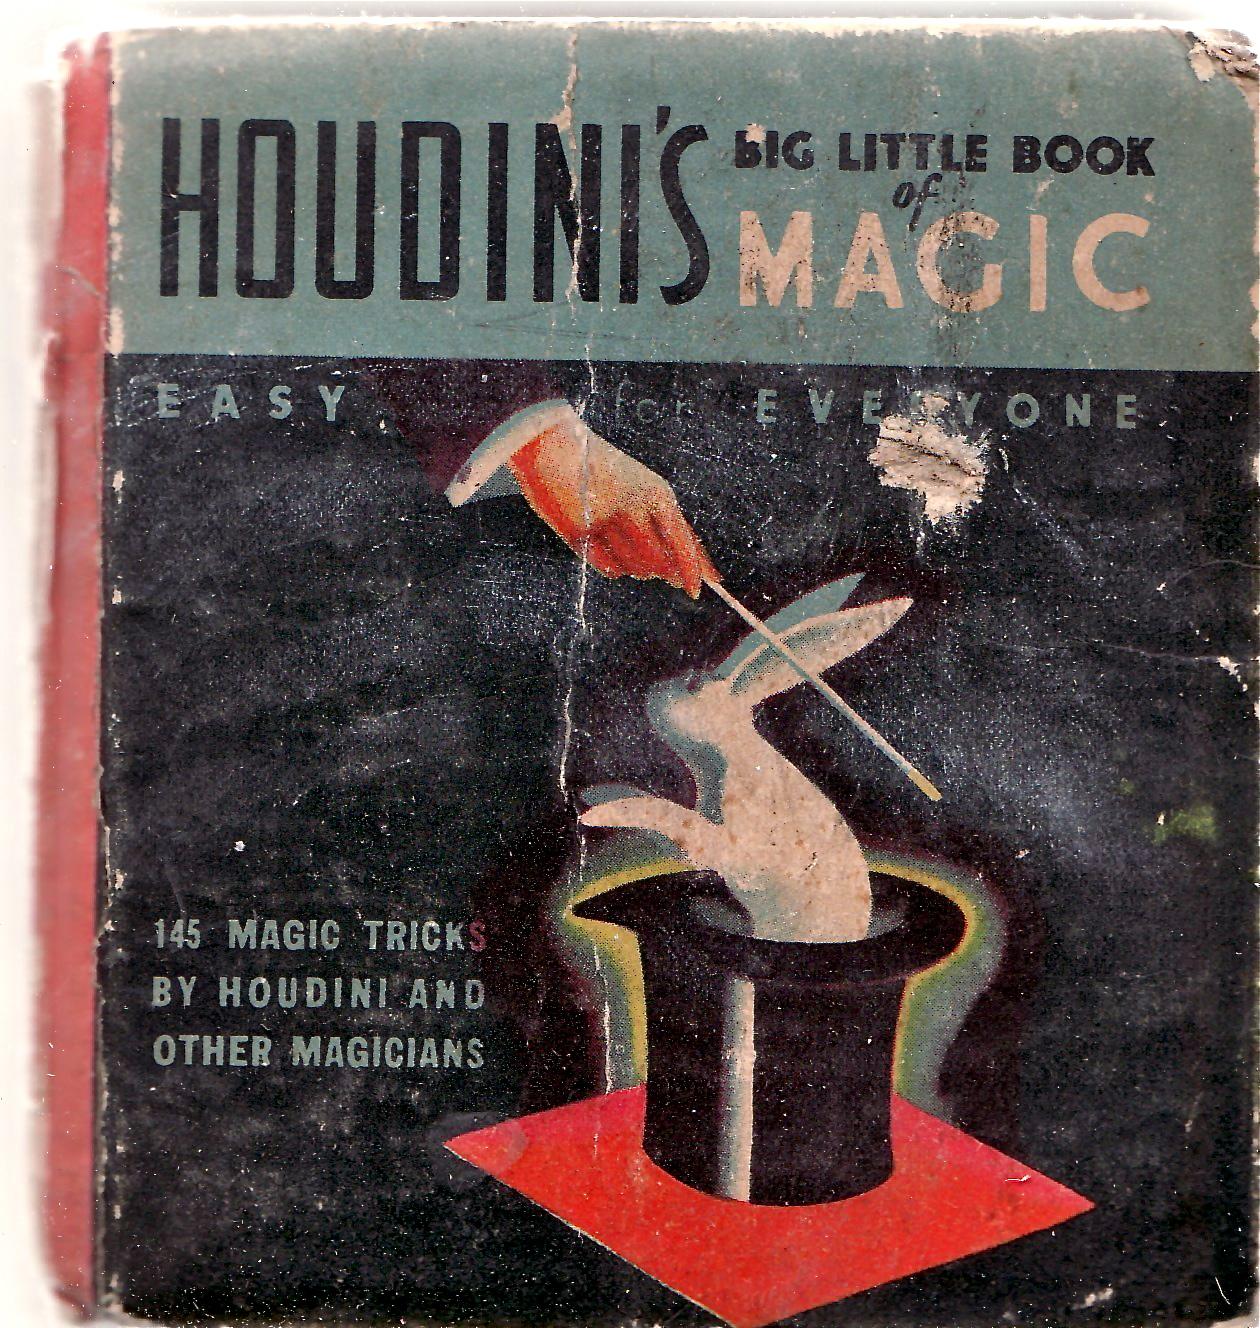 Houdini's Big Little Book of Magic 1933. Found on ebay.